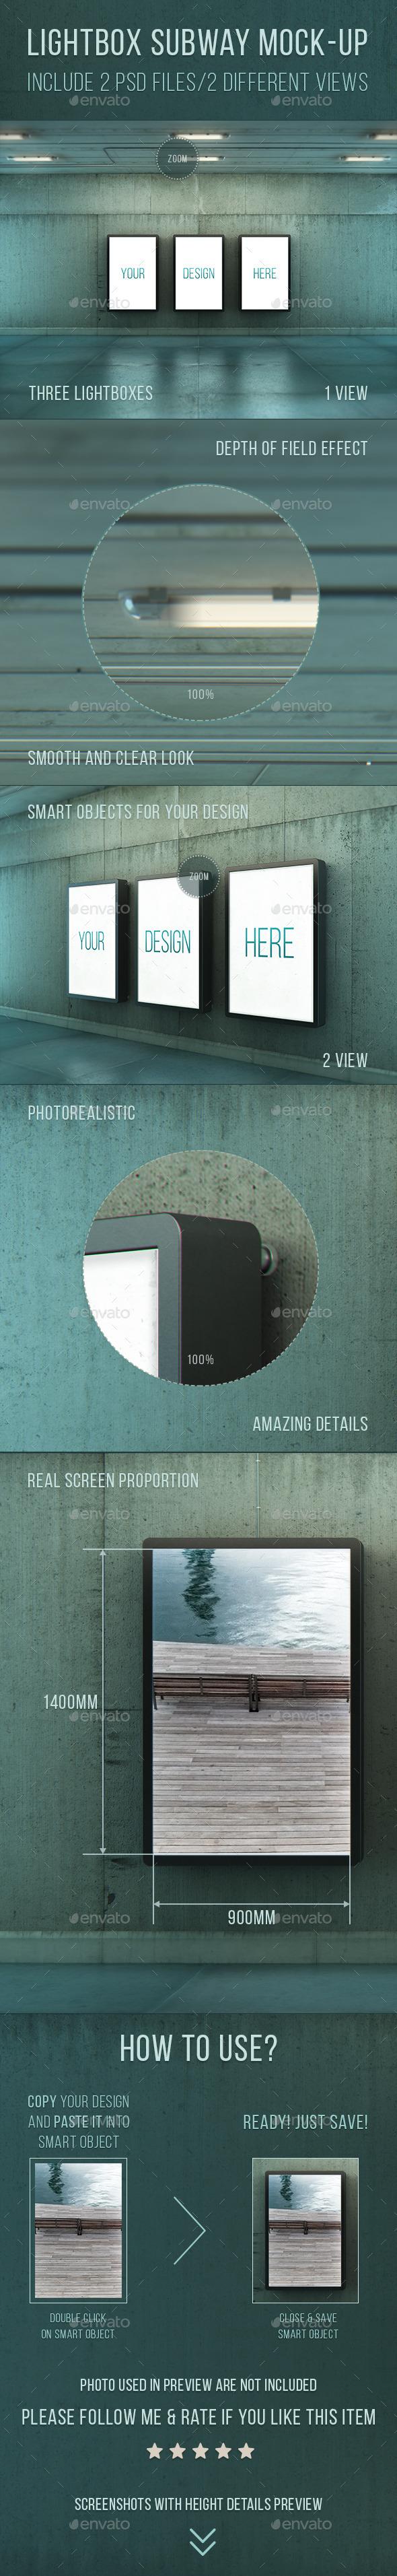 GraphicRiver Lightbox Subway Mockups 10564196